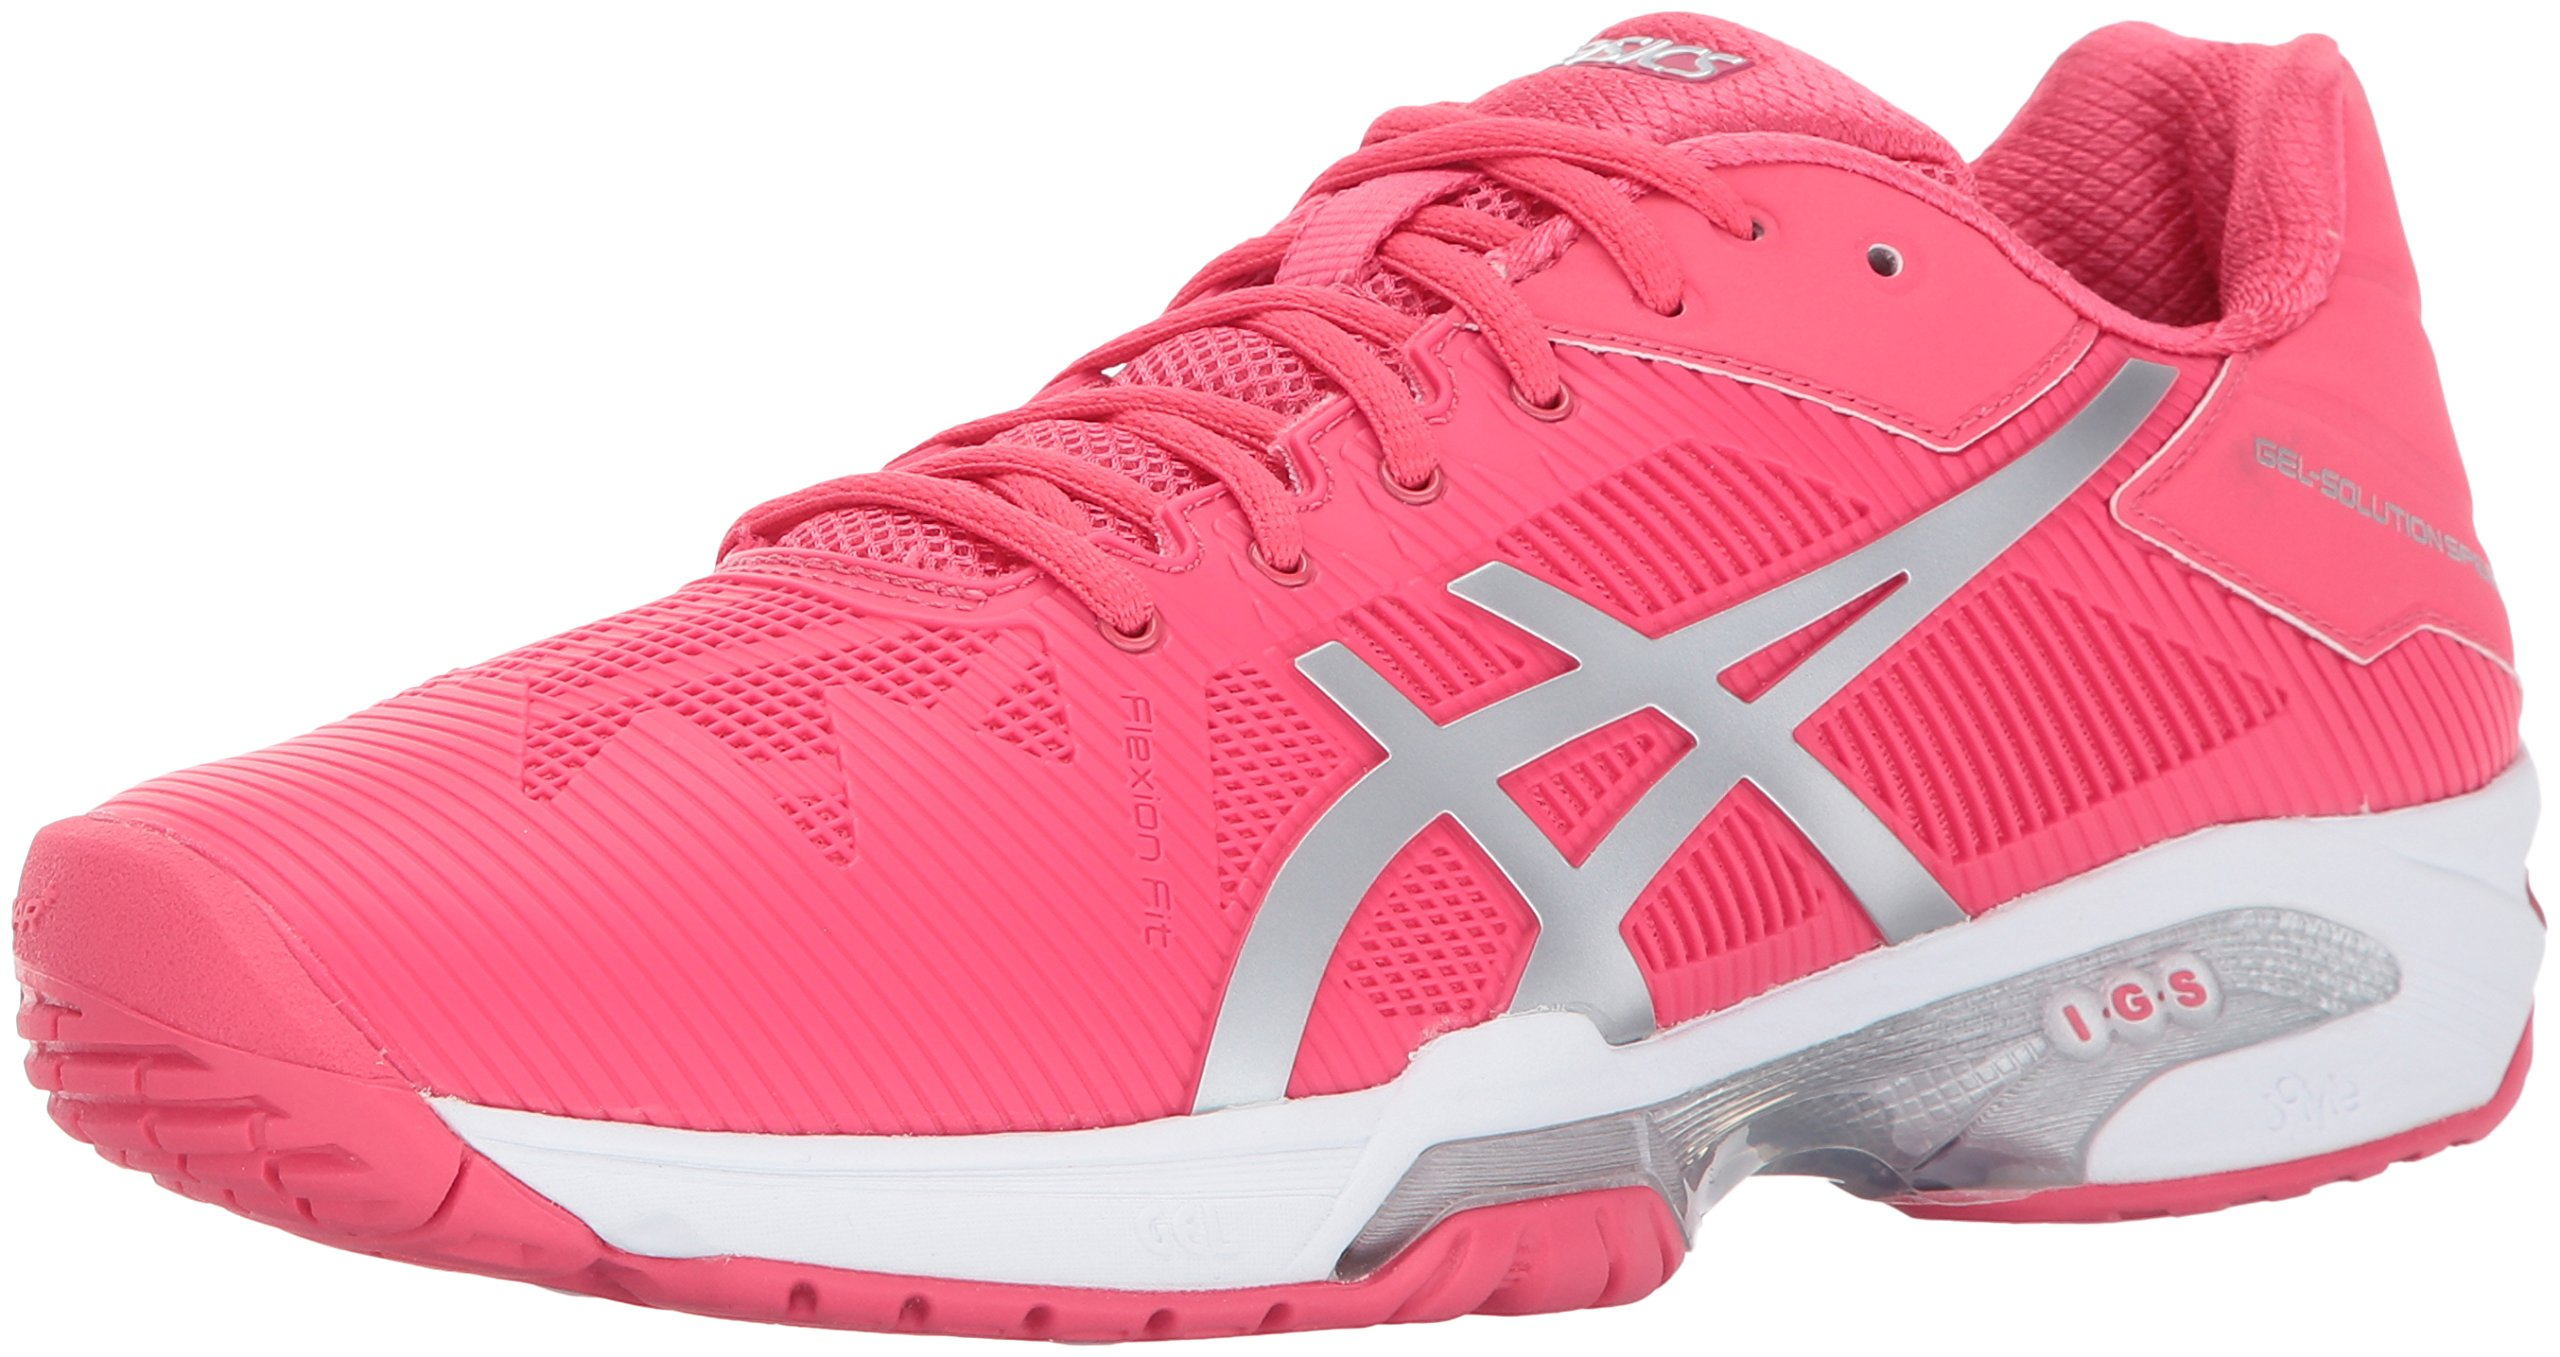 8b96b13c507f4 ASICS Womens Gel-Solution Speed 3 Tennis Shoe, Rouge Red/Silver/White, 7.5  Medium US